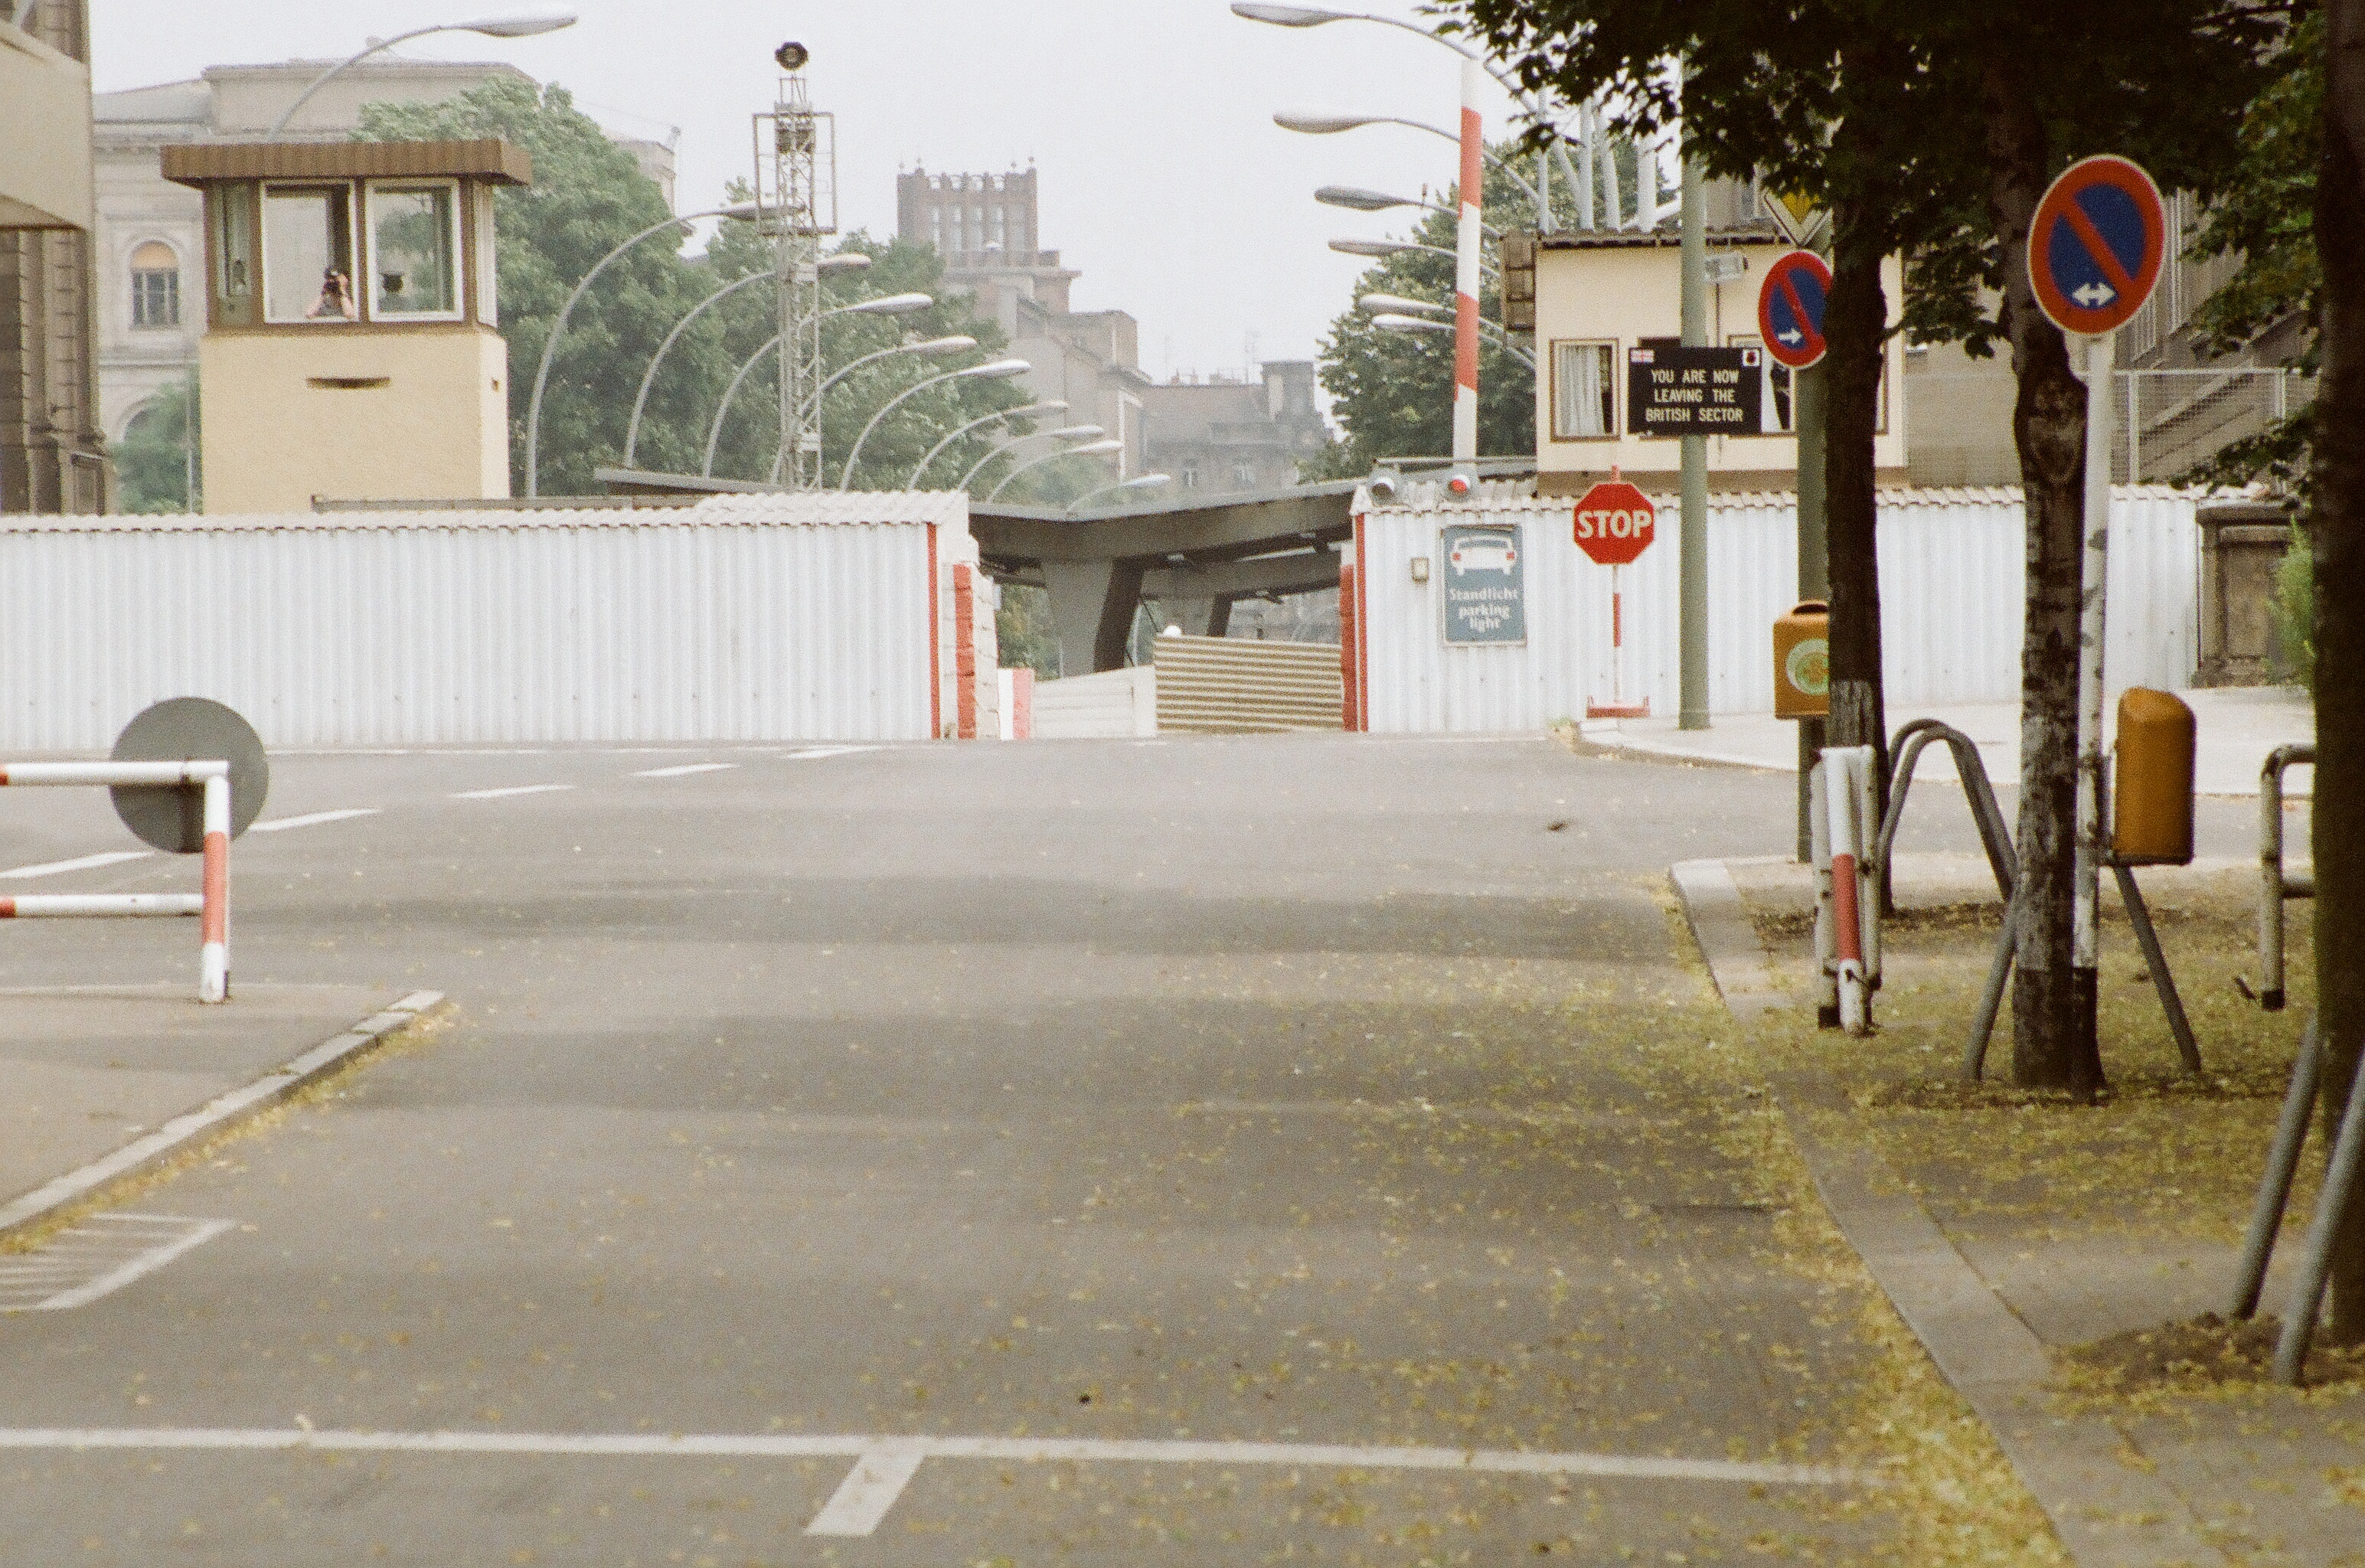 Berliner Mauer 1987 00010020.jpg